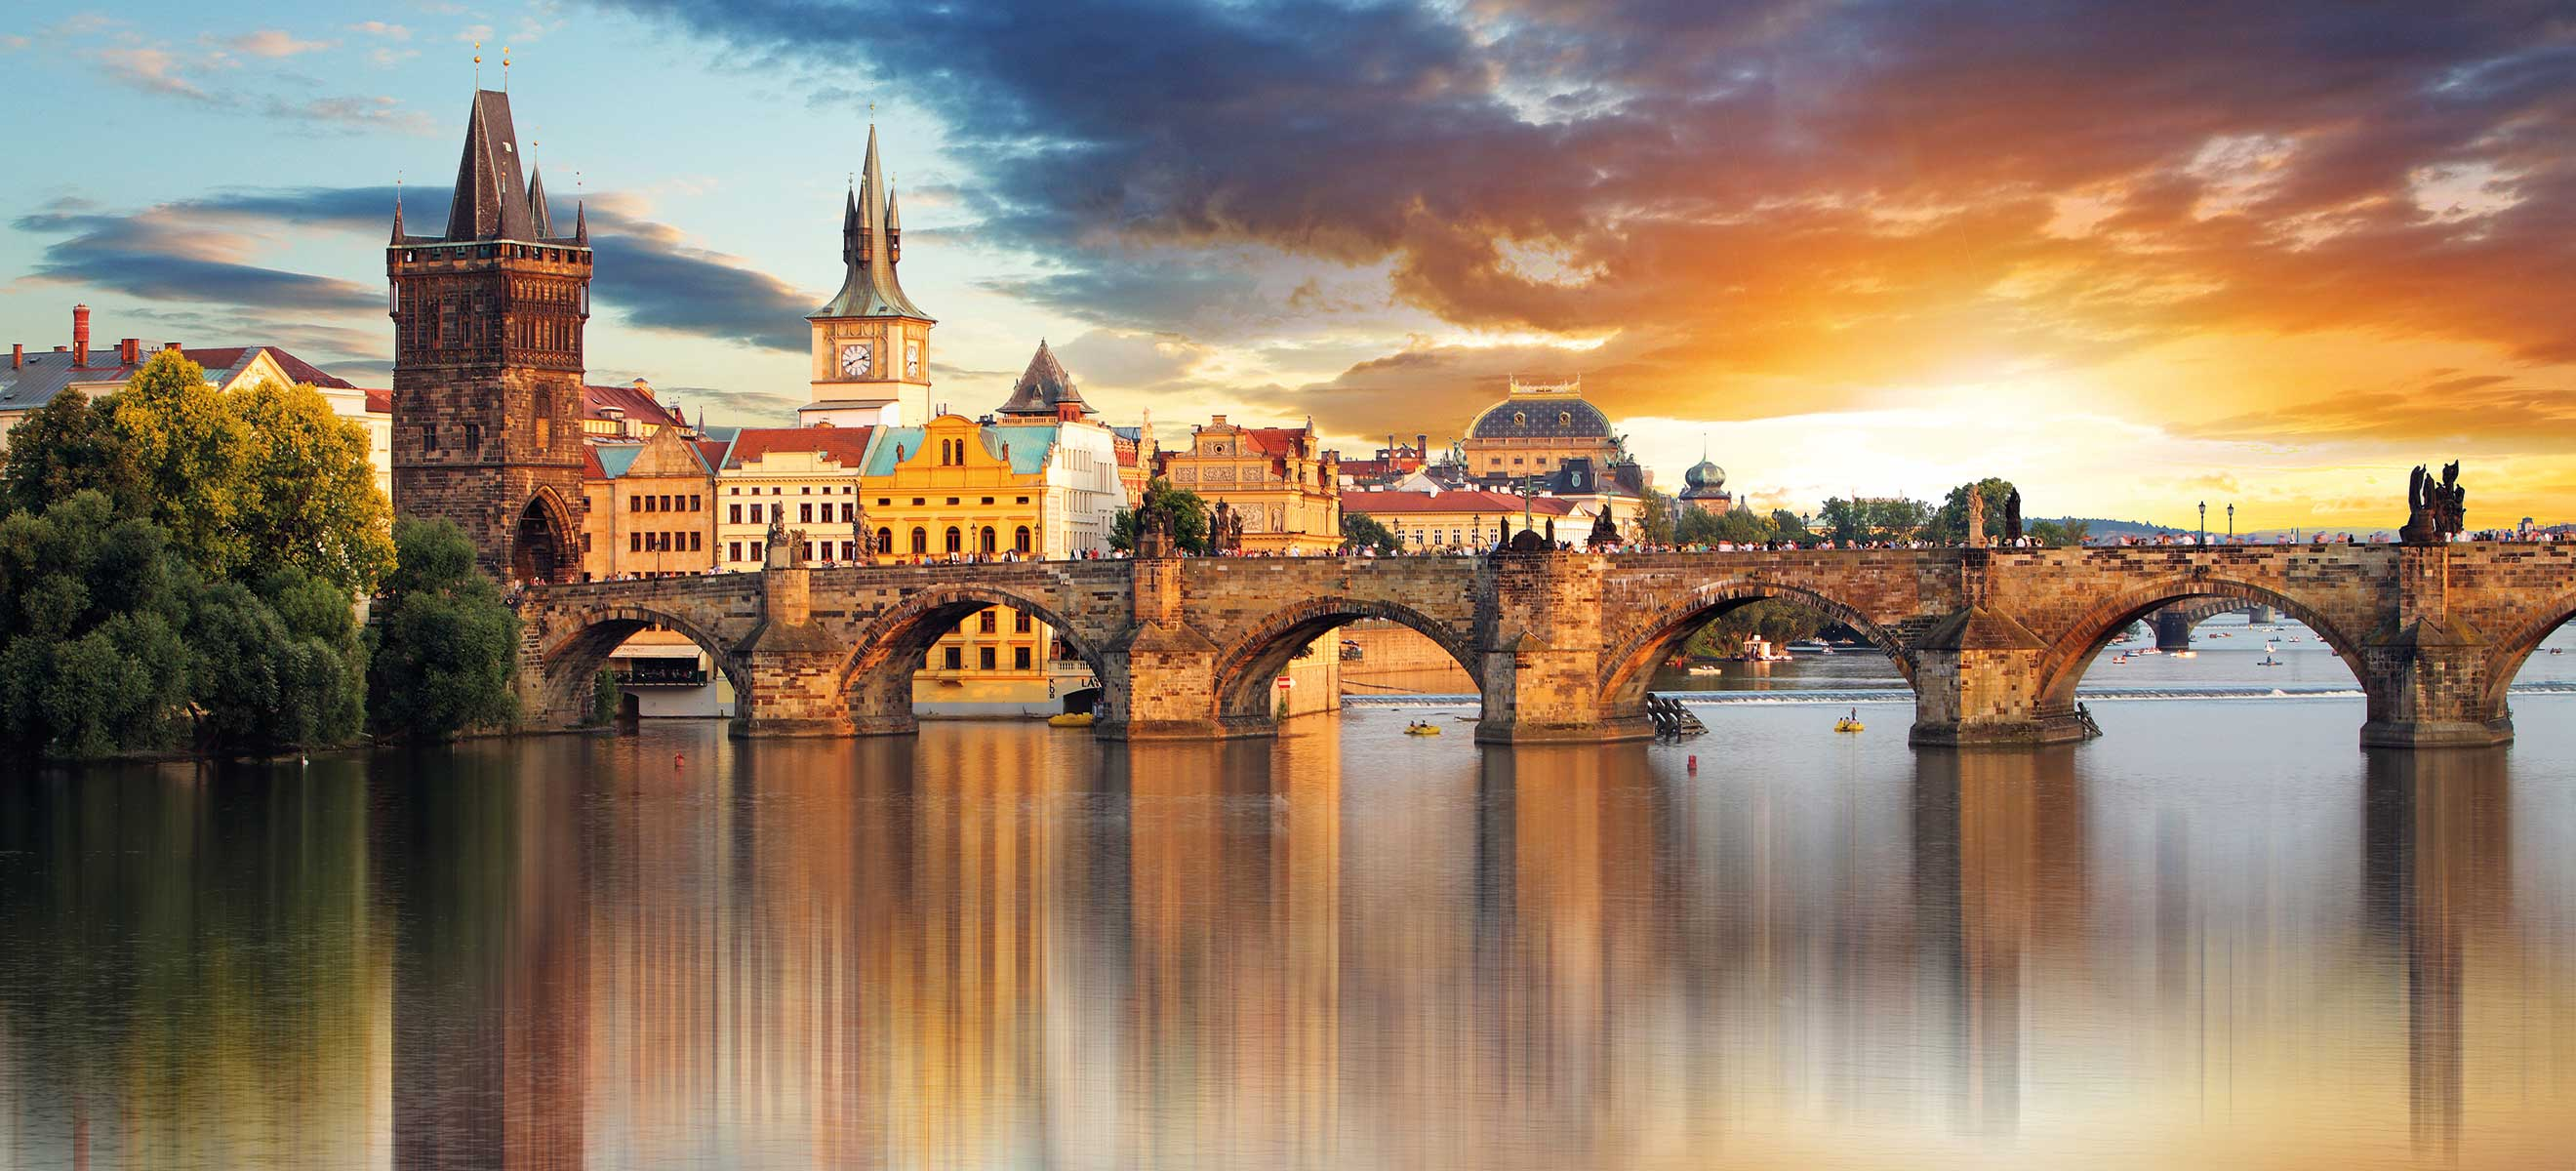 Orta Çağ Masal Kenti Prag